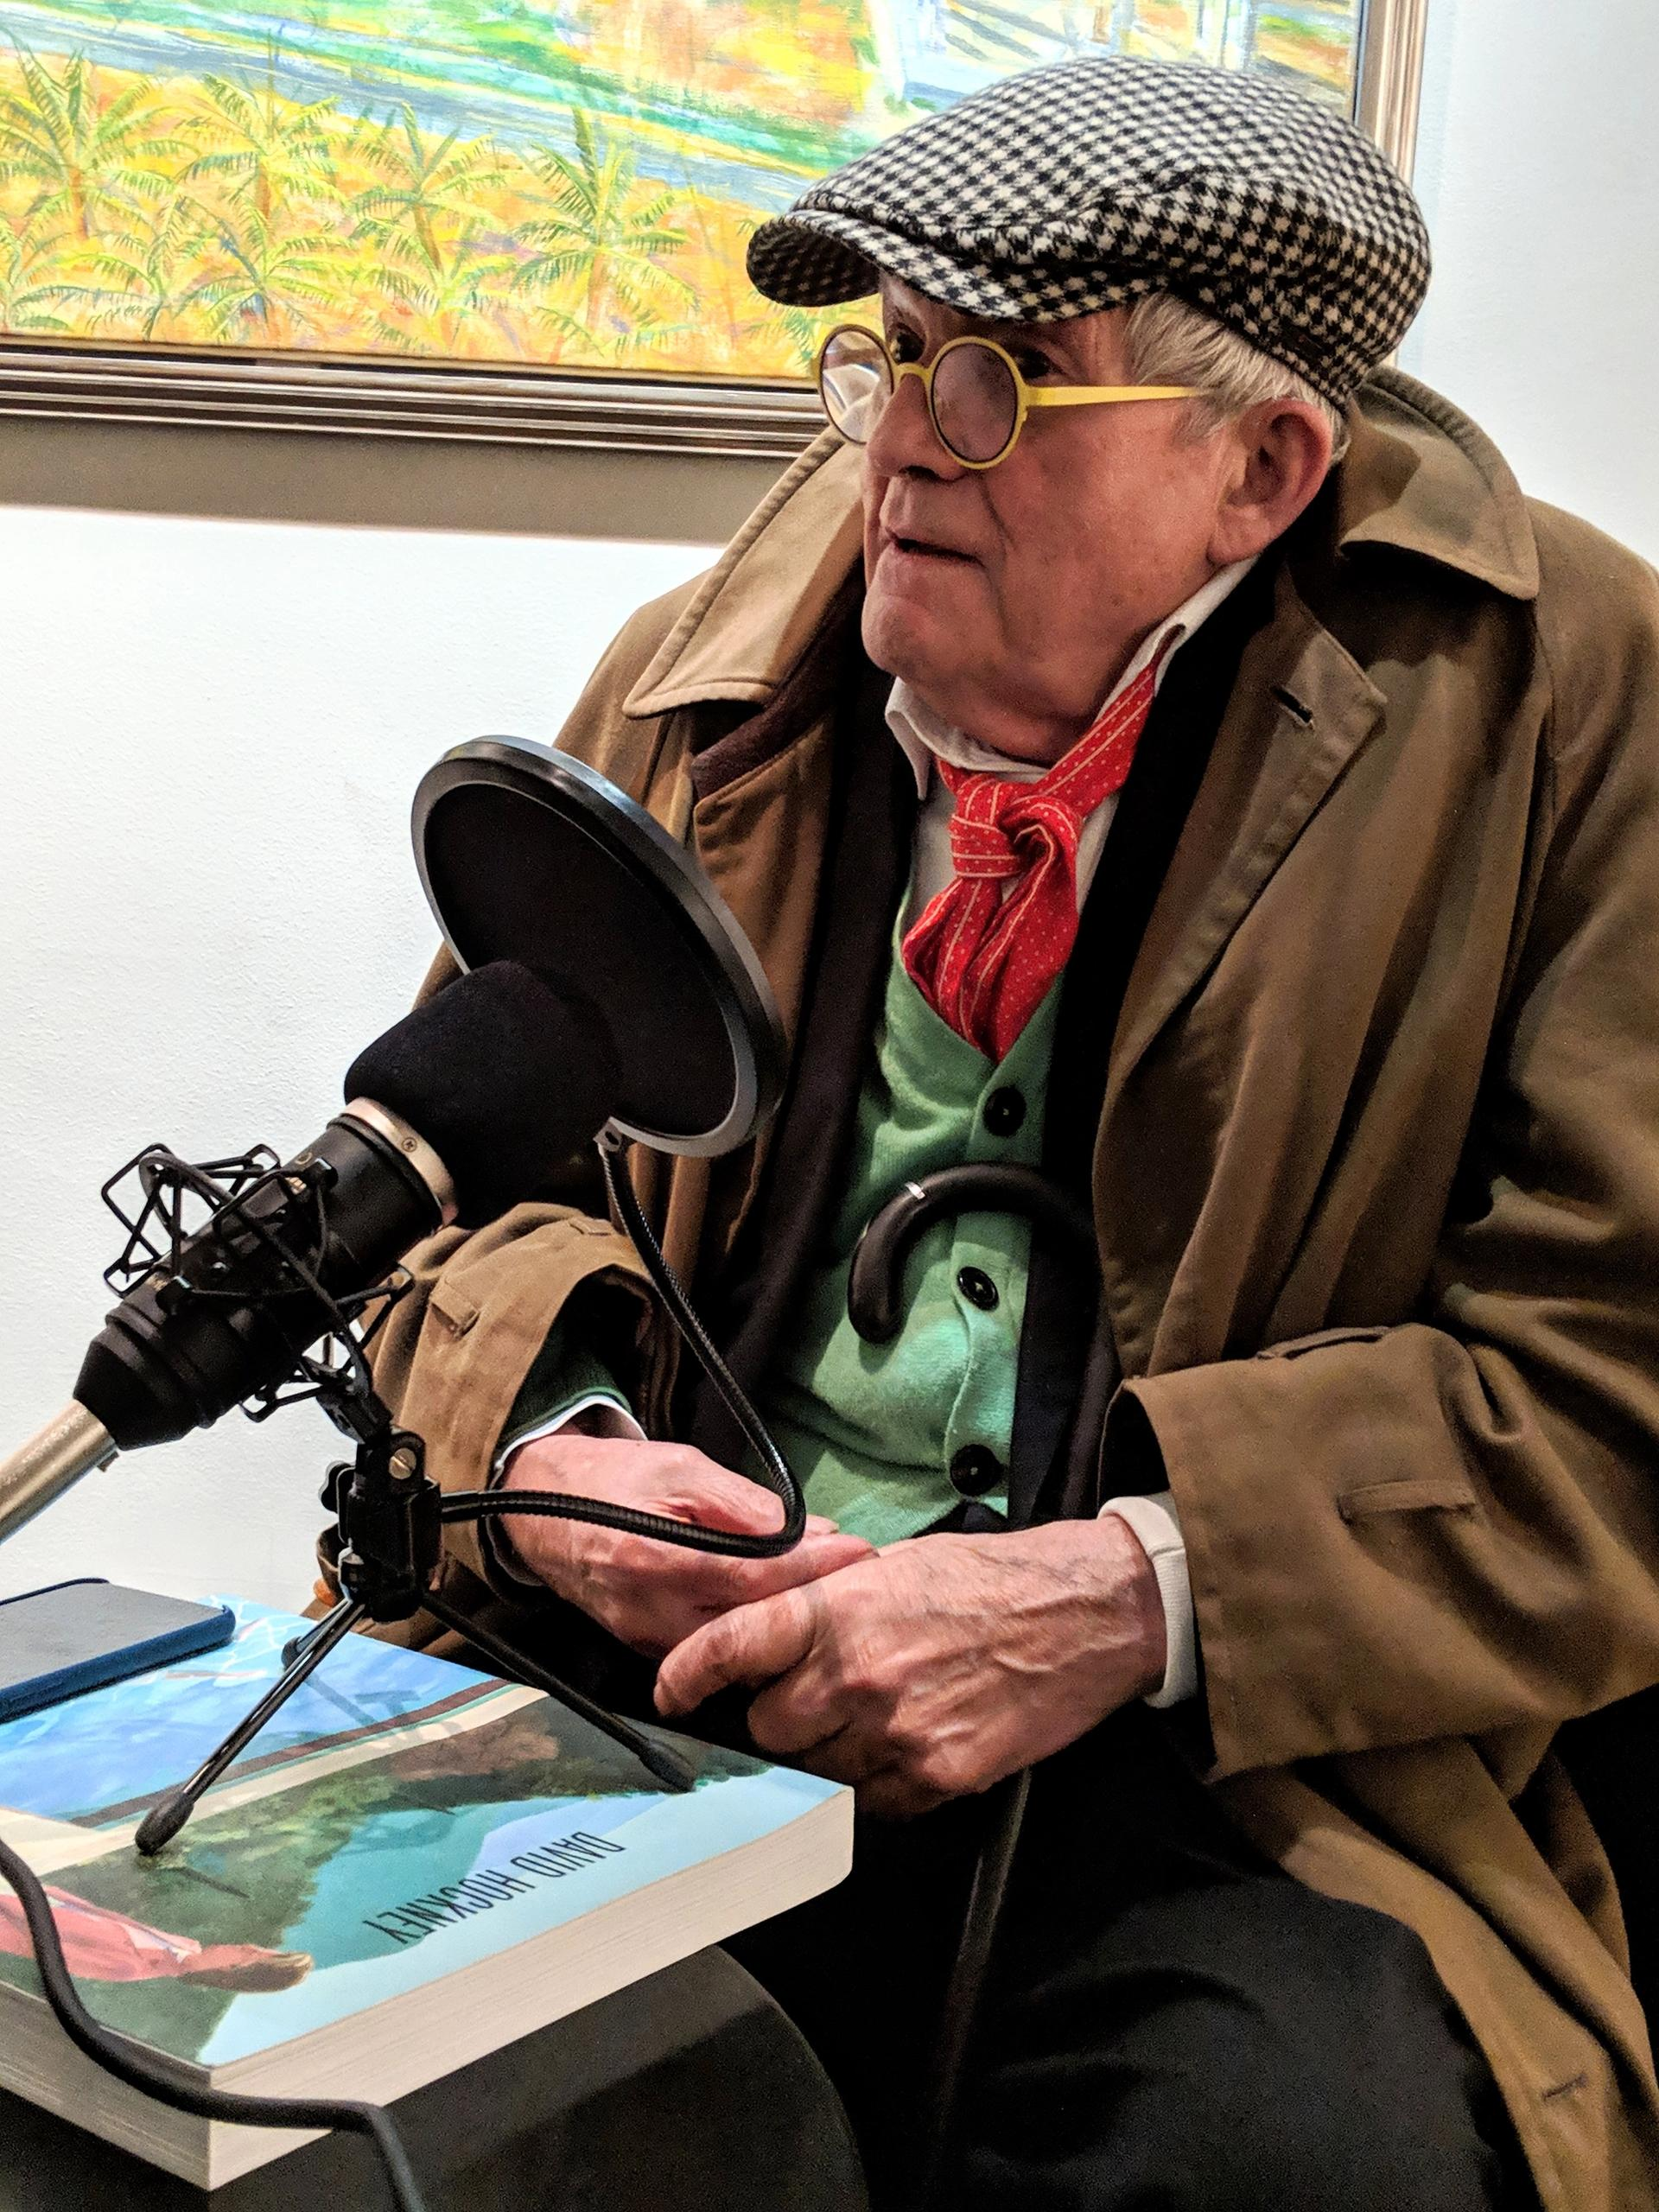 David Hockney speaking on The Art Newspaper podcast David Clack